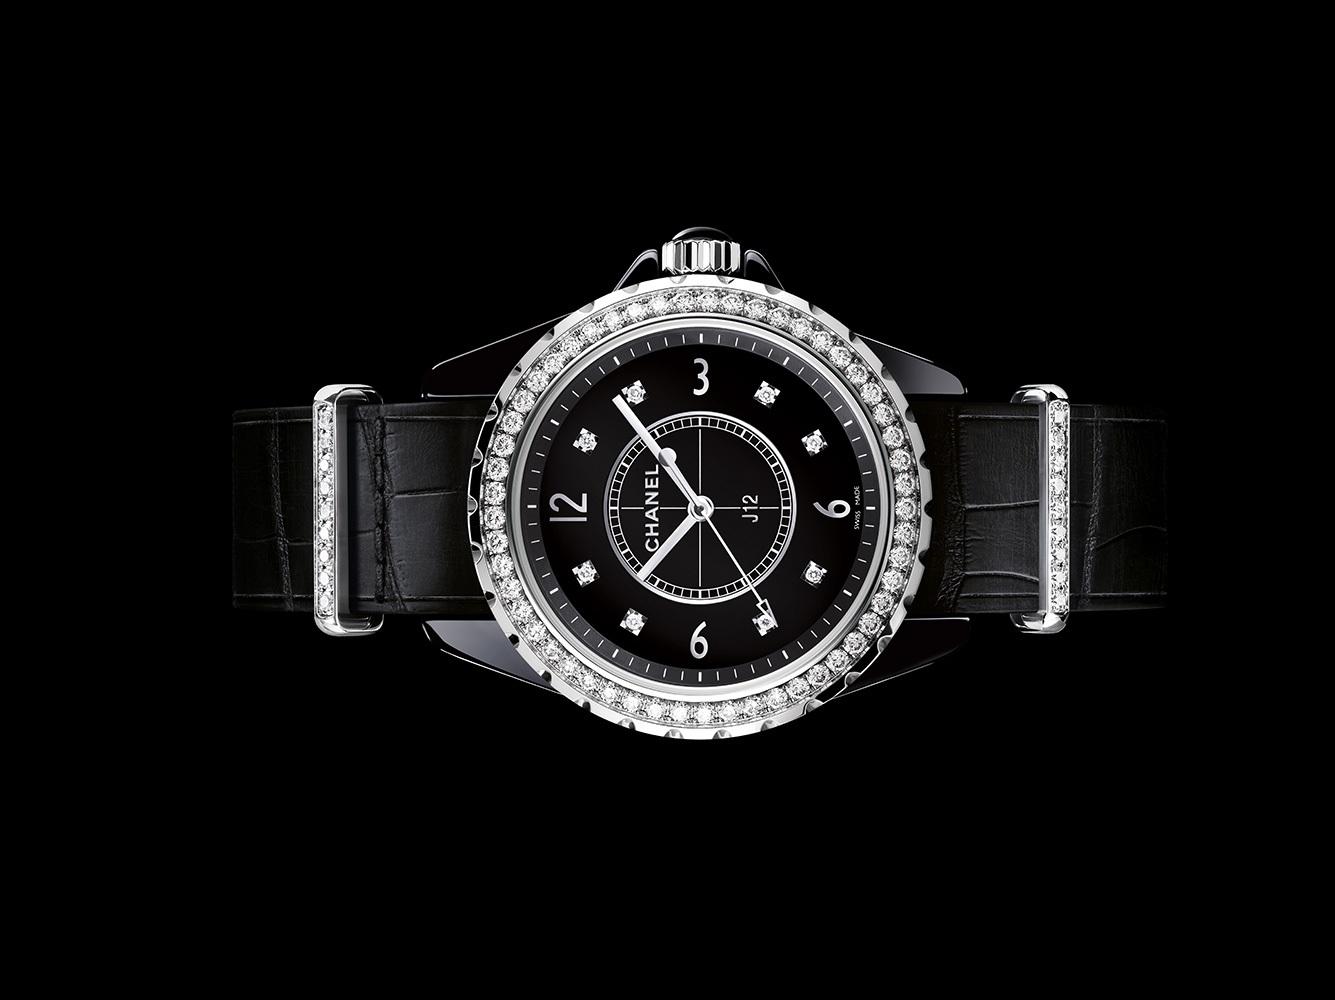 Os novos relógios da Chanel, os J12-G.10